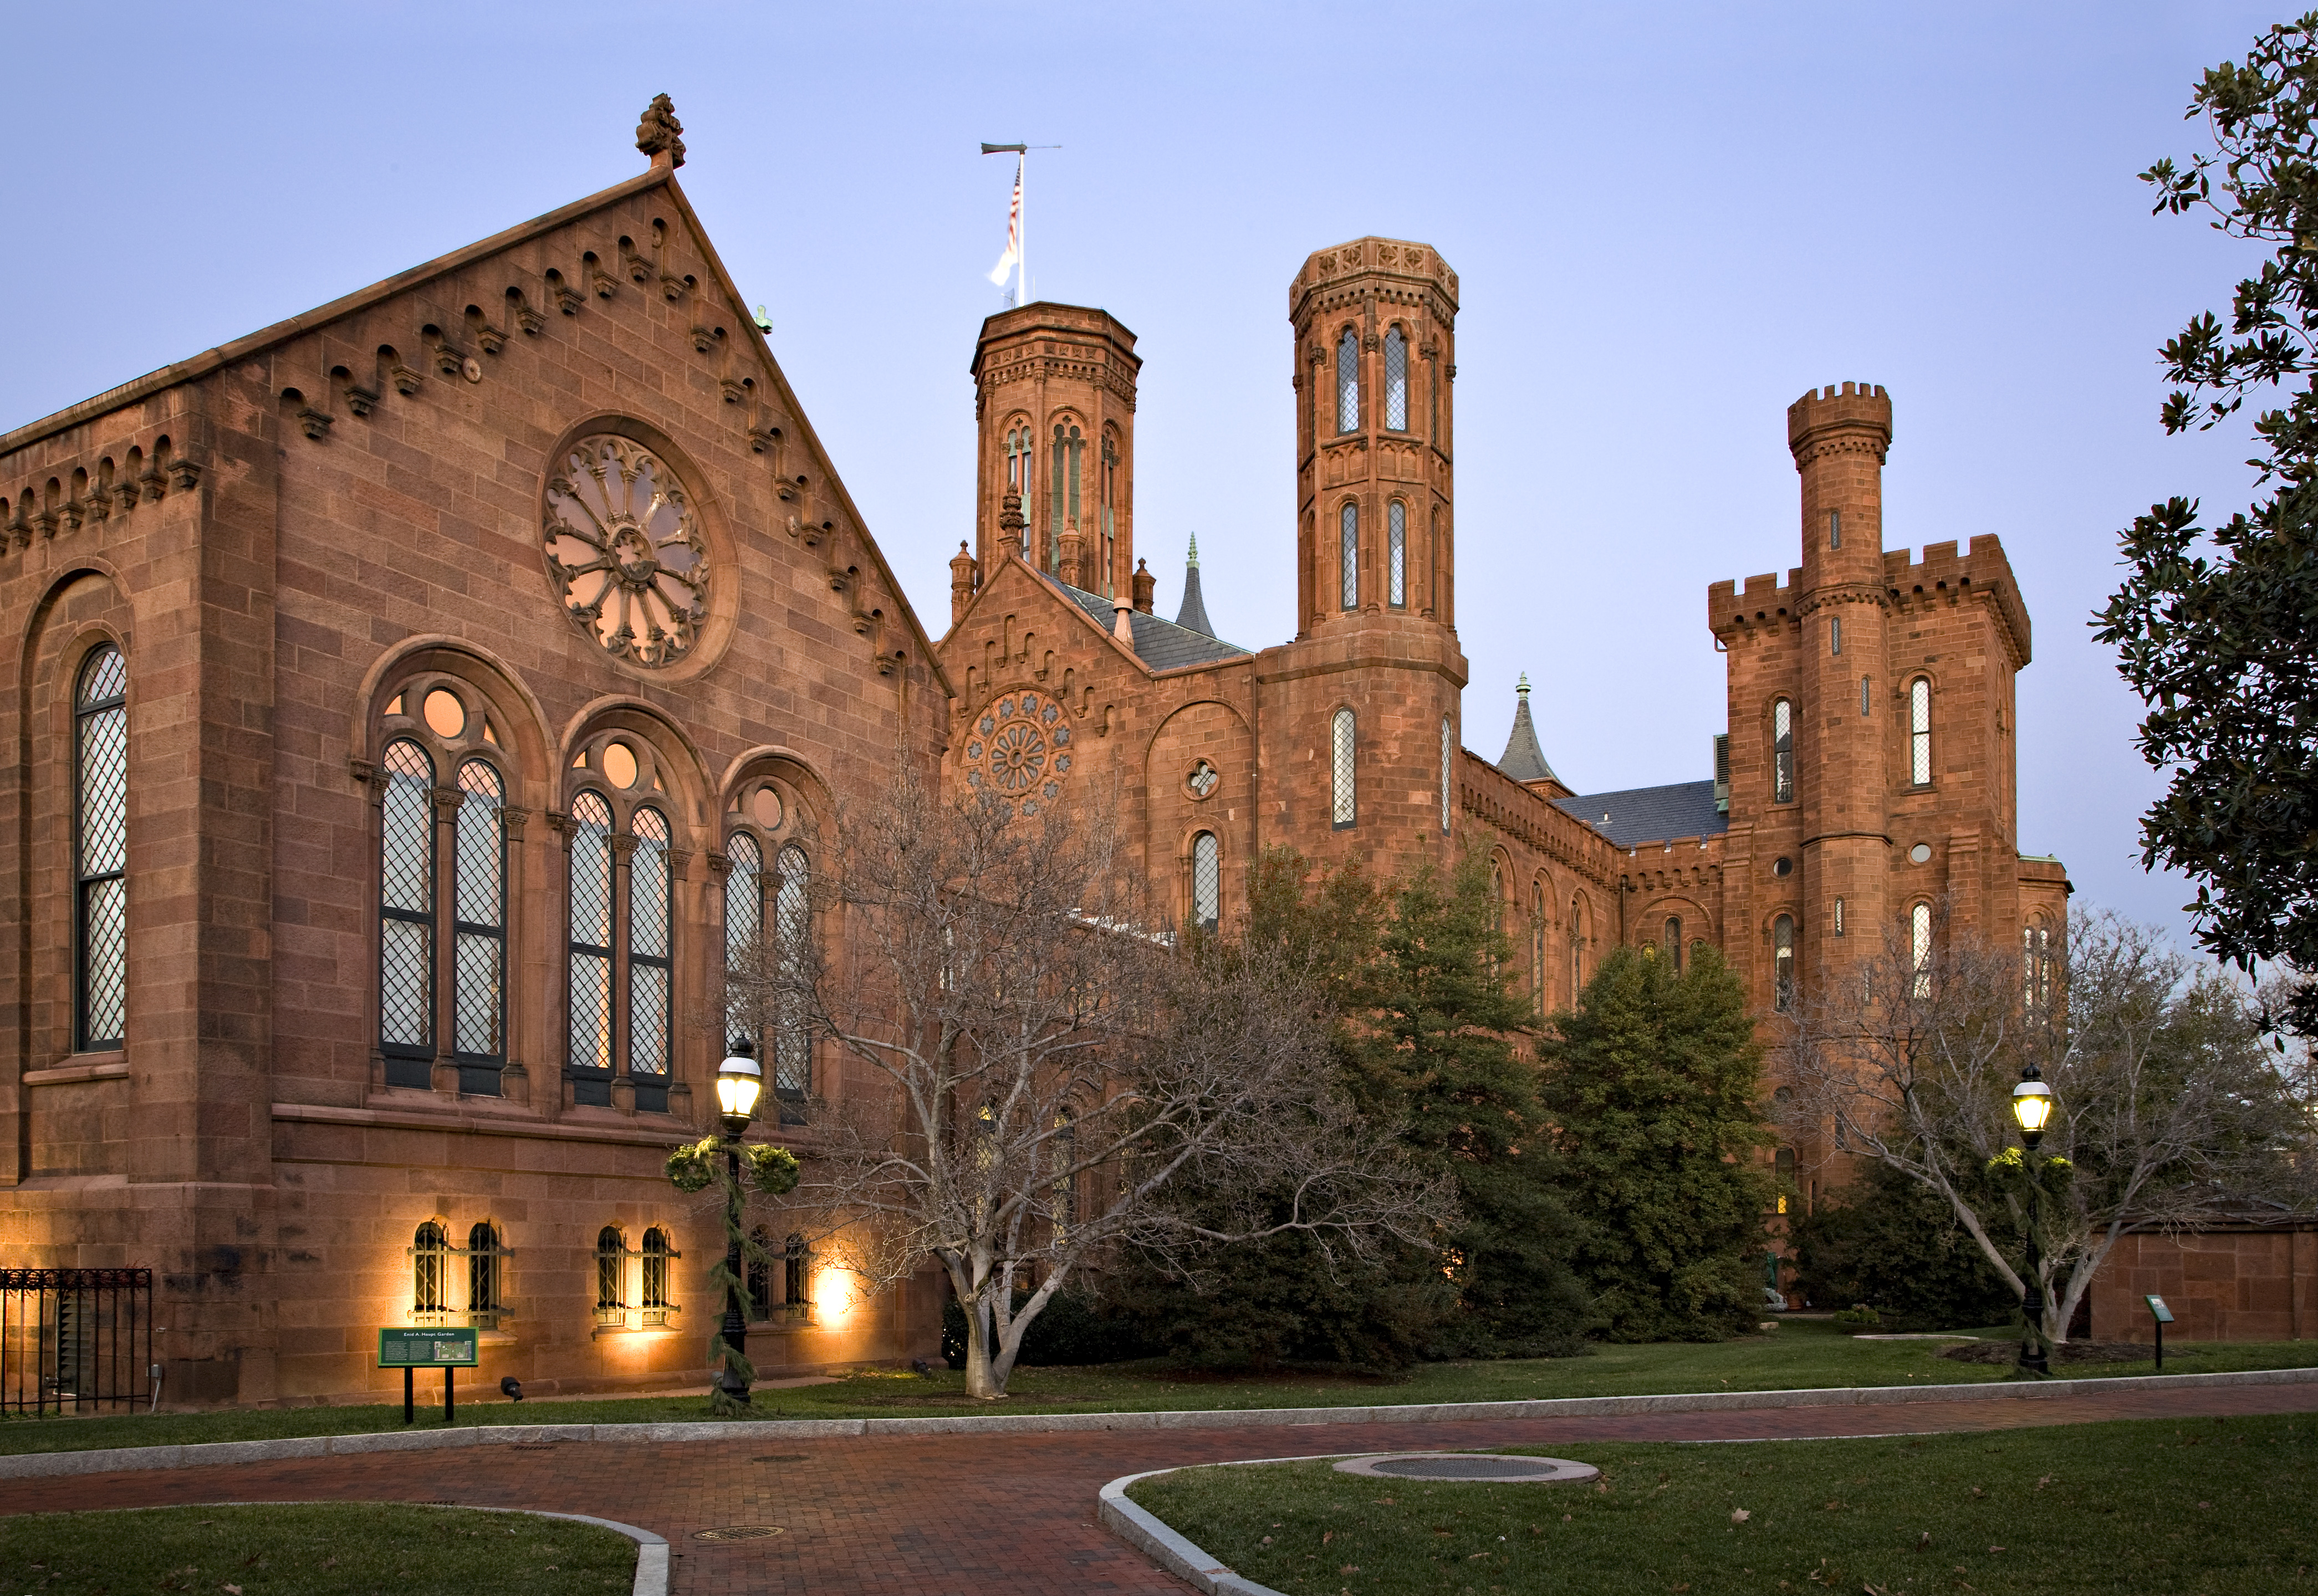 Smithsonian Castle Building at dusk